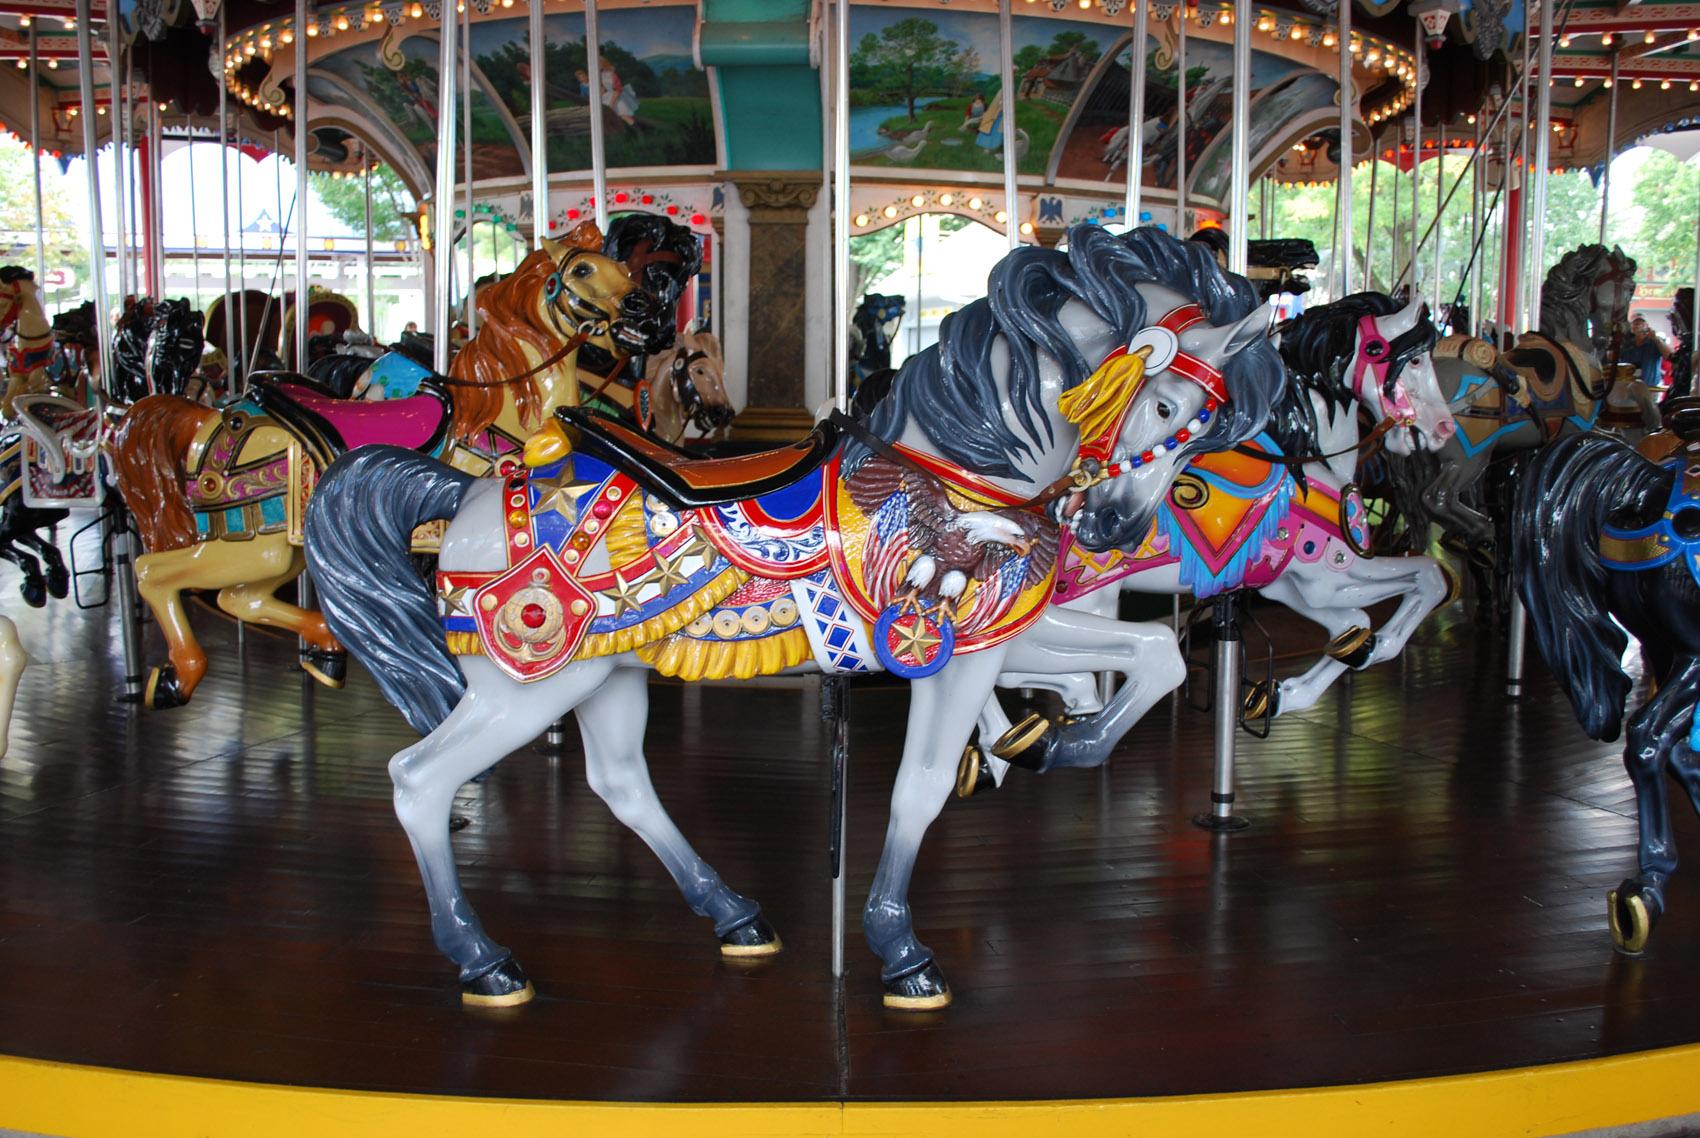 Ca-1919-Hersheypark-PTC-47-carousel-horse-0306